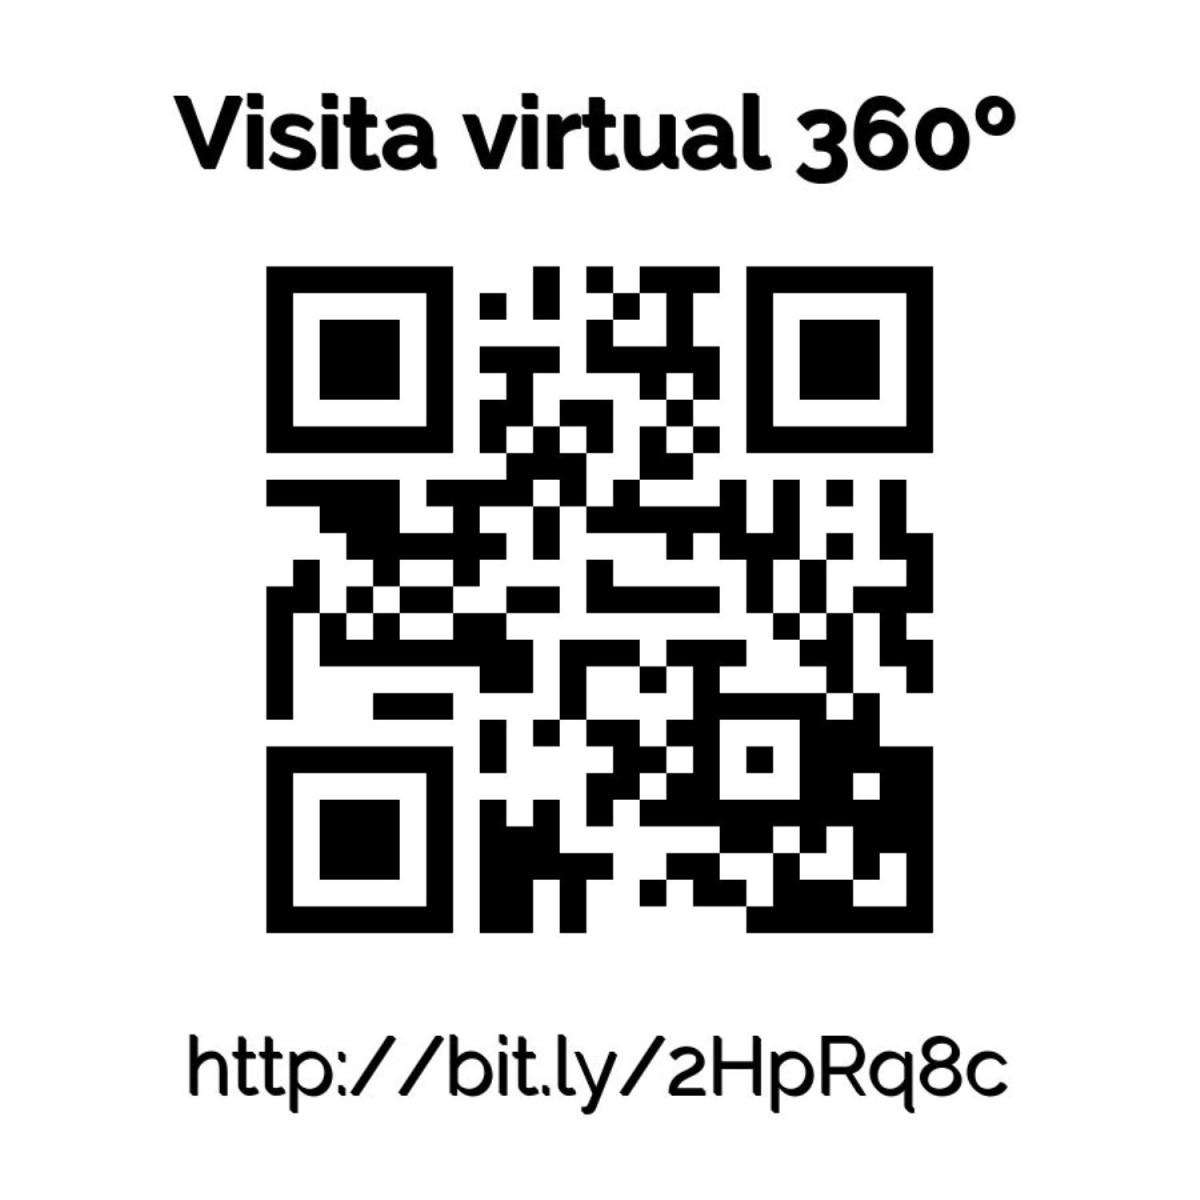 3408-03482